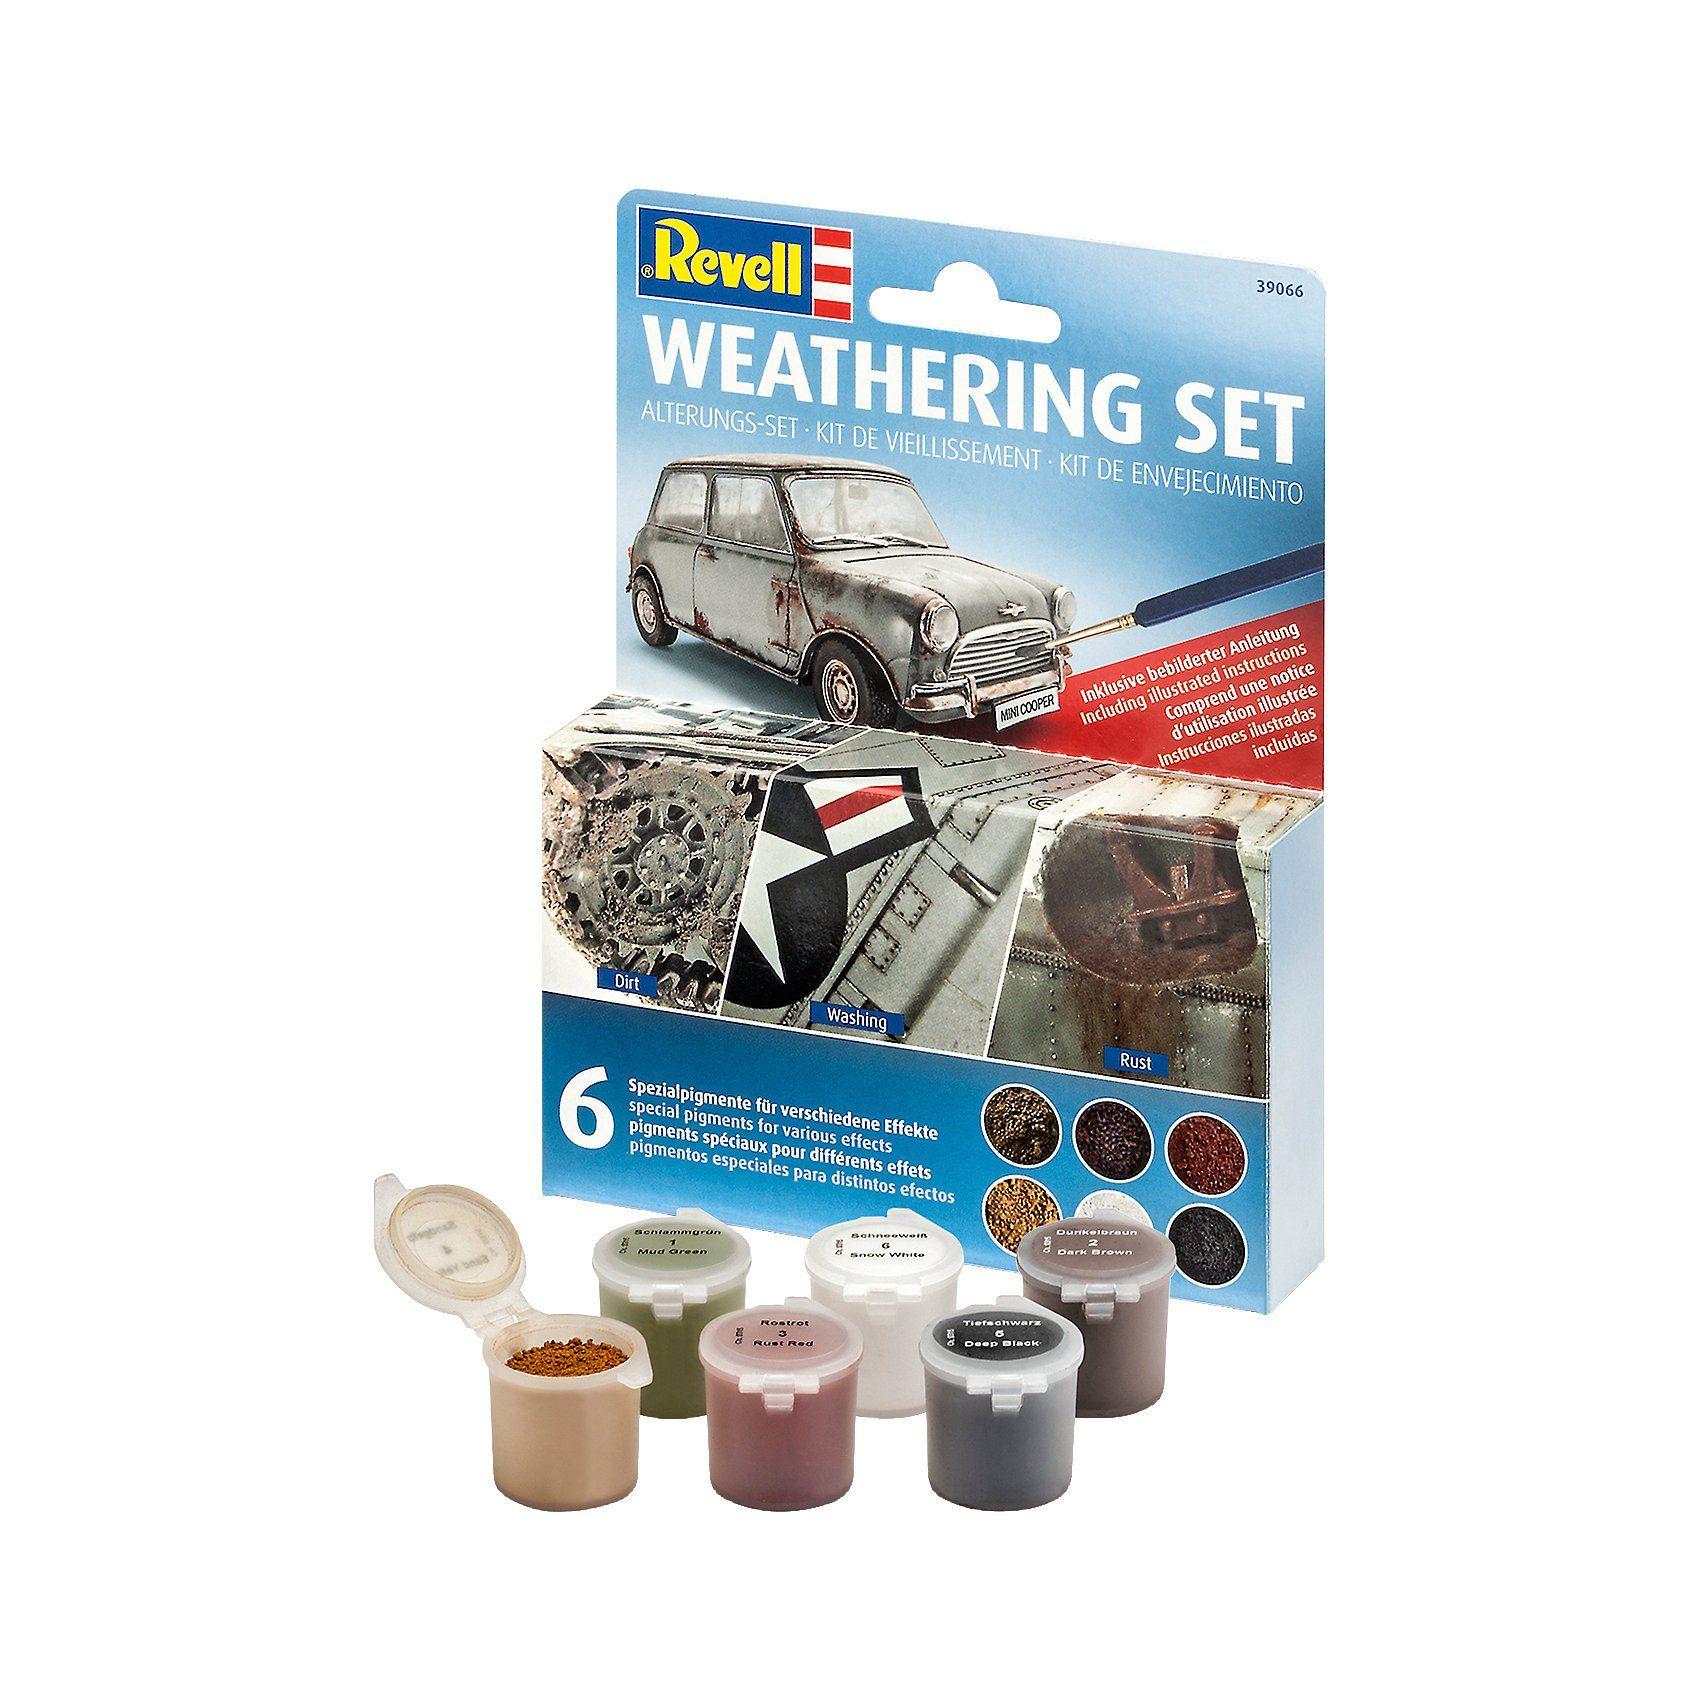 Revell Modellbausatz - Weathering Set (6 Pigmente)